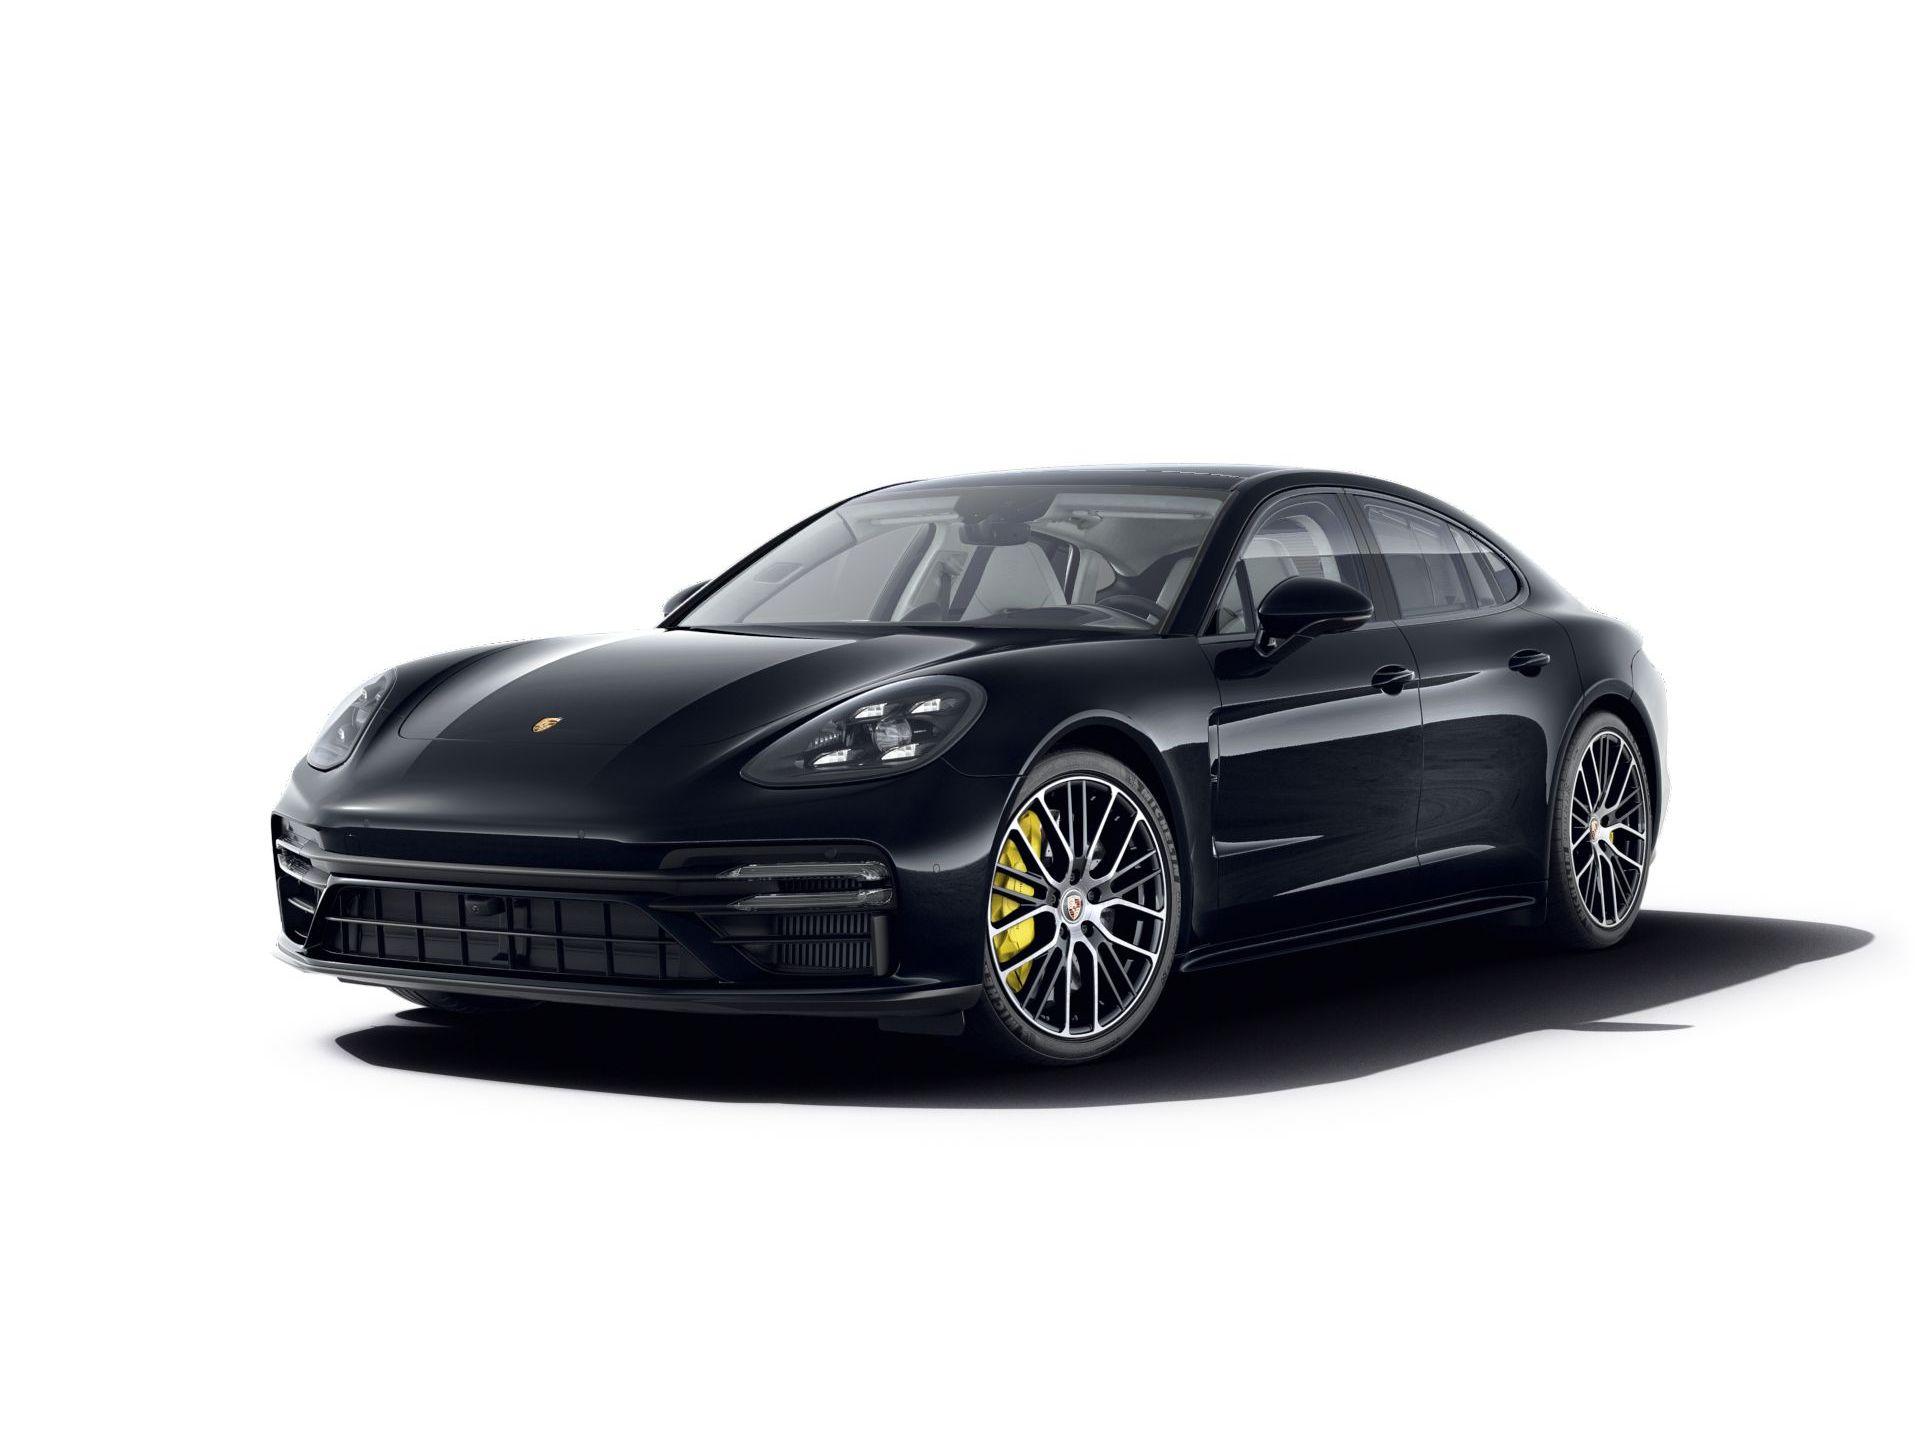 2022 Porsche Panamera Turbo S – 1